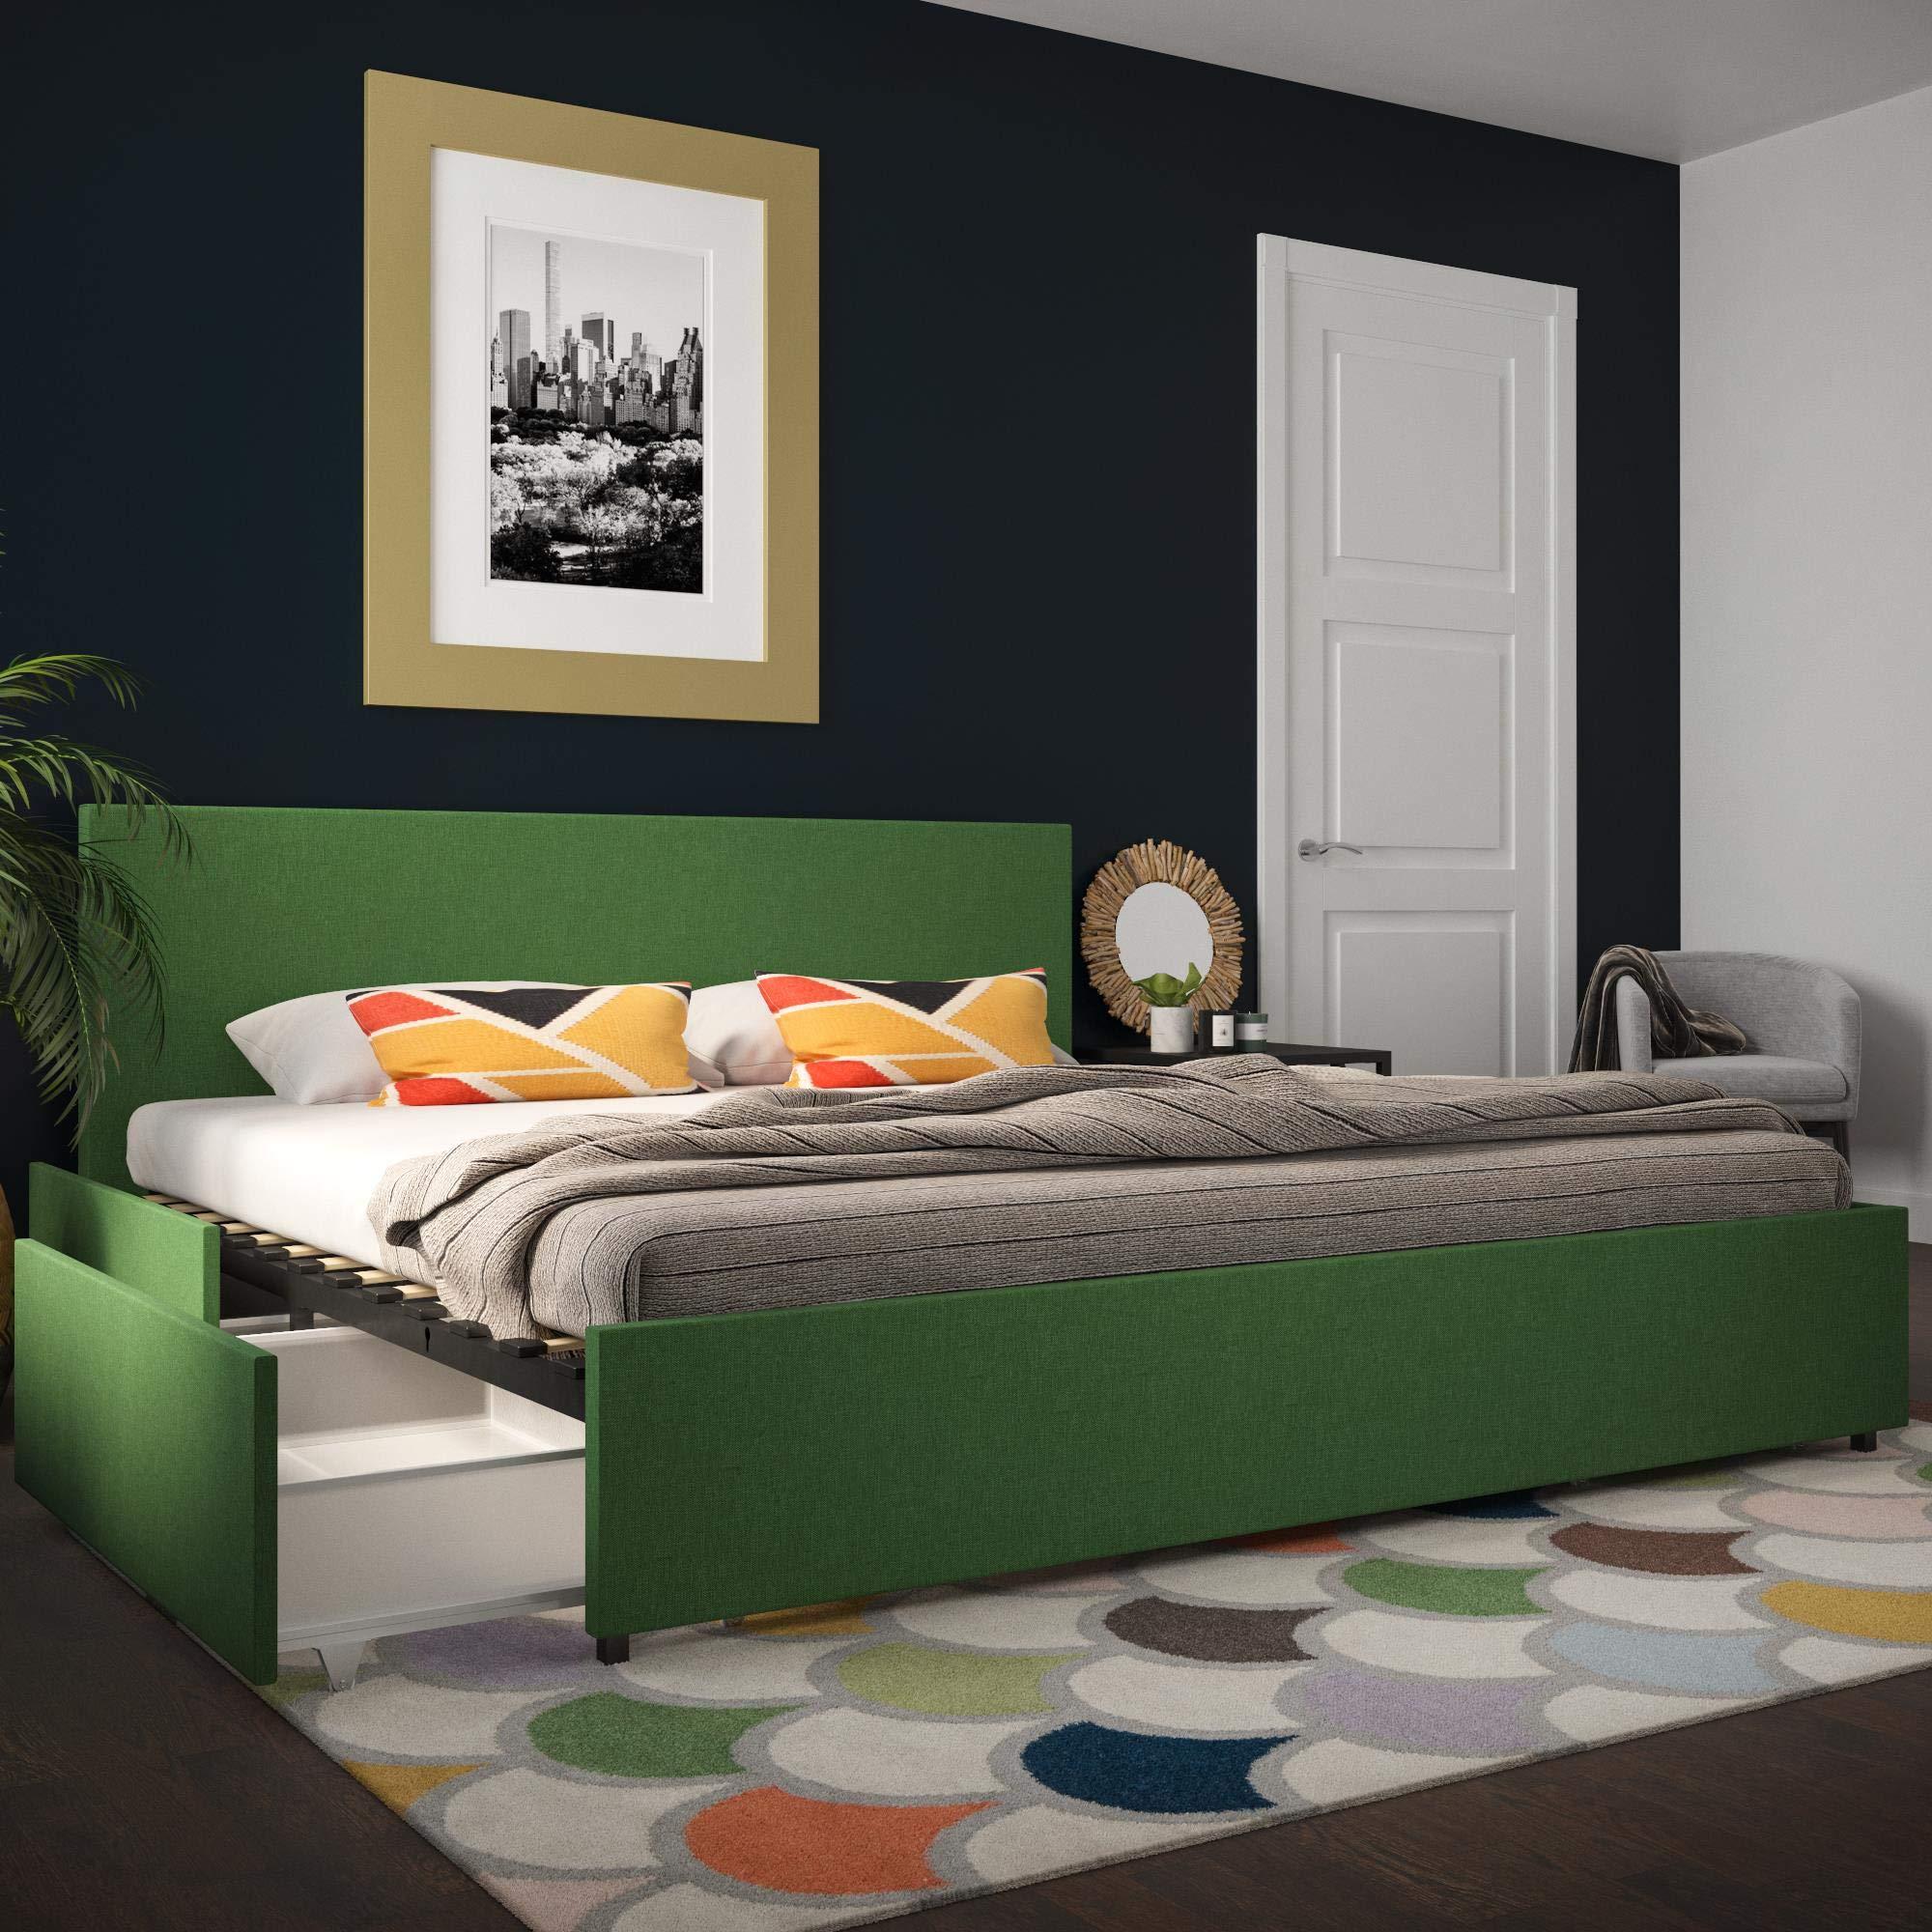 Novogratz Kelly Bed with Storage, Green, King